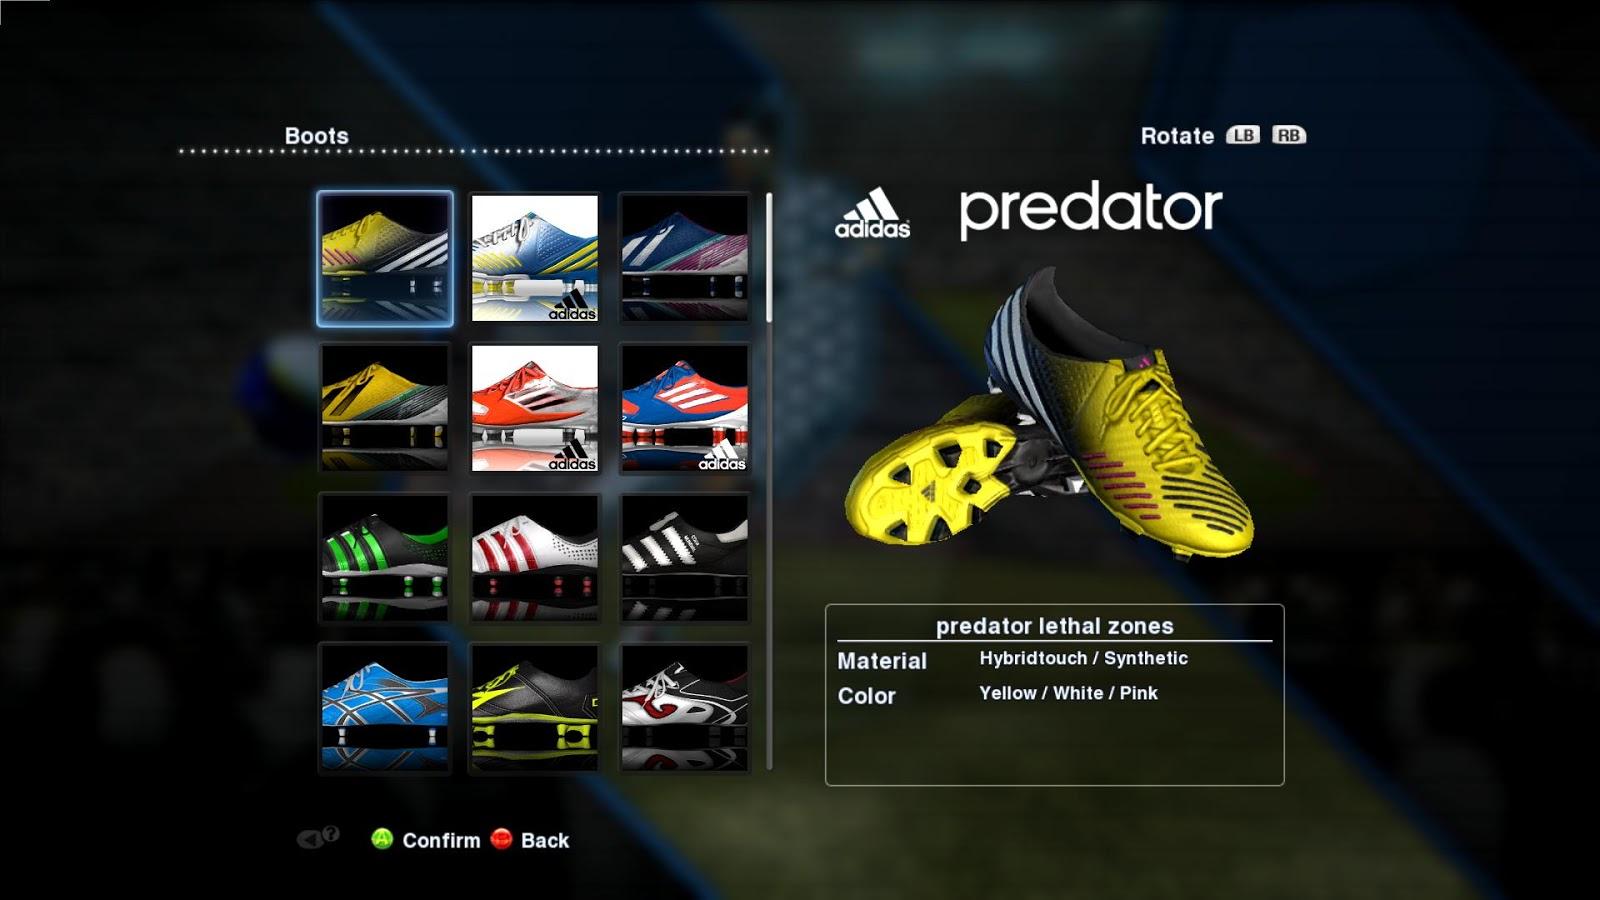 boots pes 2013 adidas